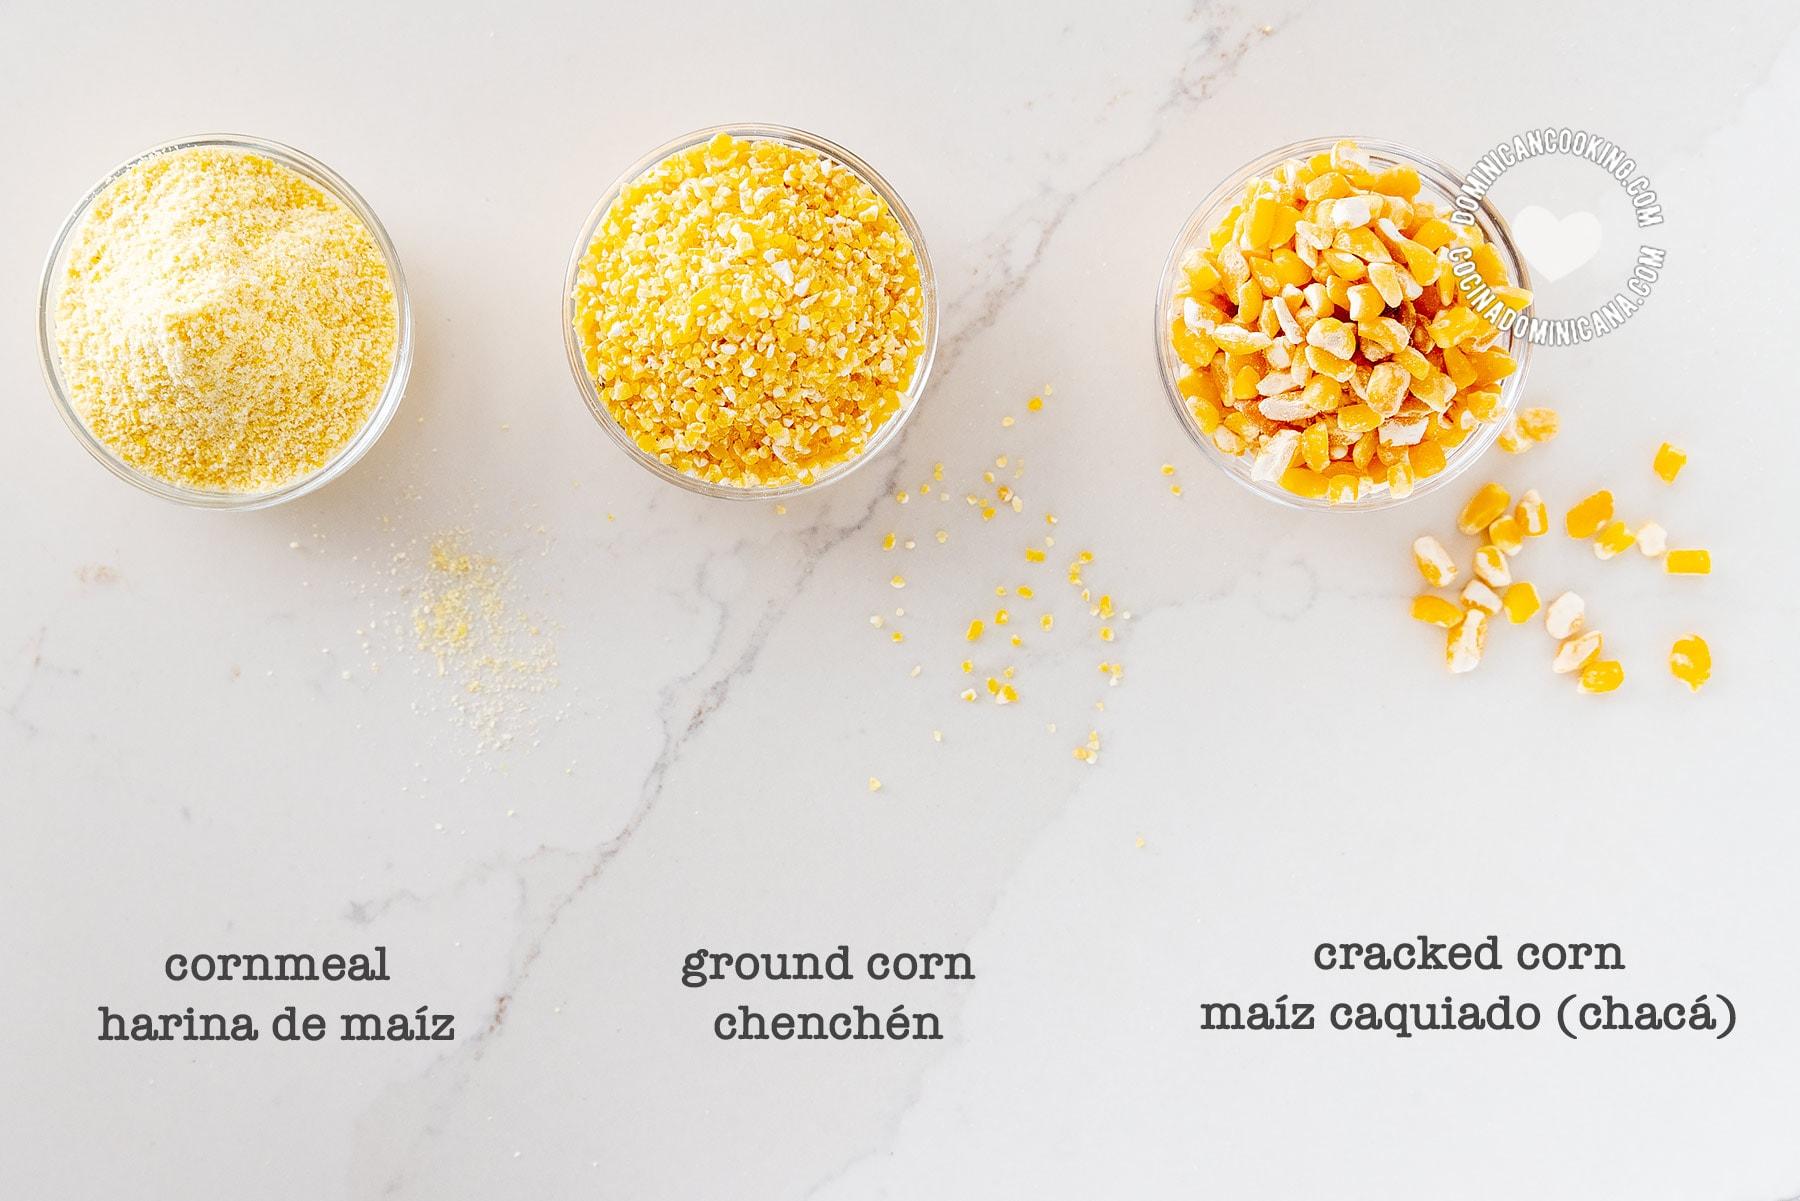 Cornmeal, and ground corn (harina de maíz)